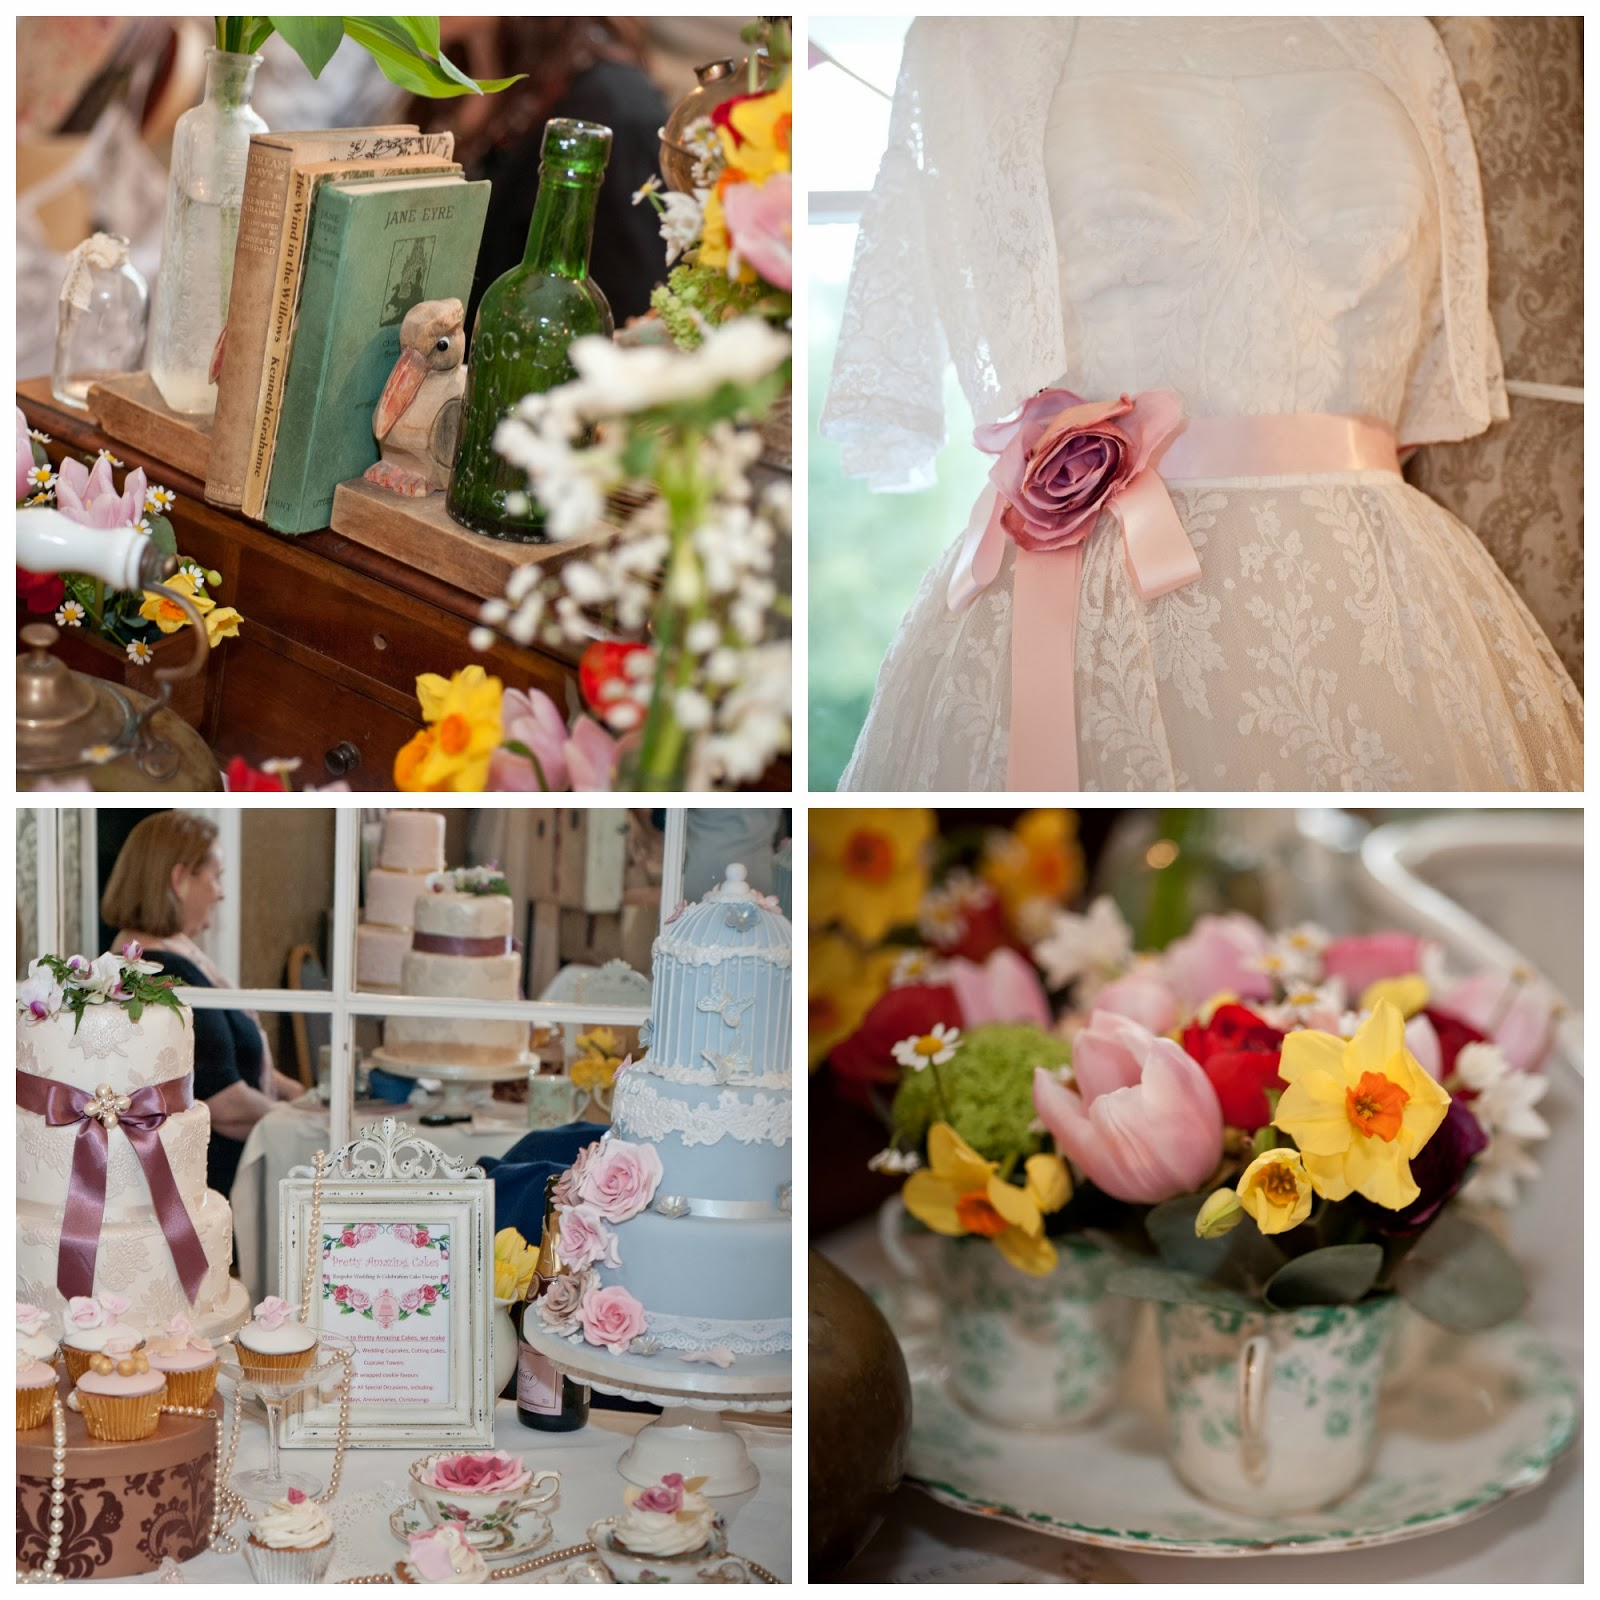 Heavenly Vintage Wedding Blog, Bristol Vintage Wedding Fair 2014